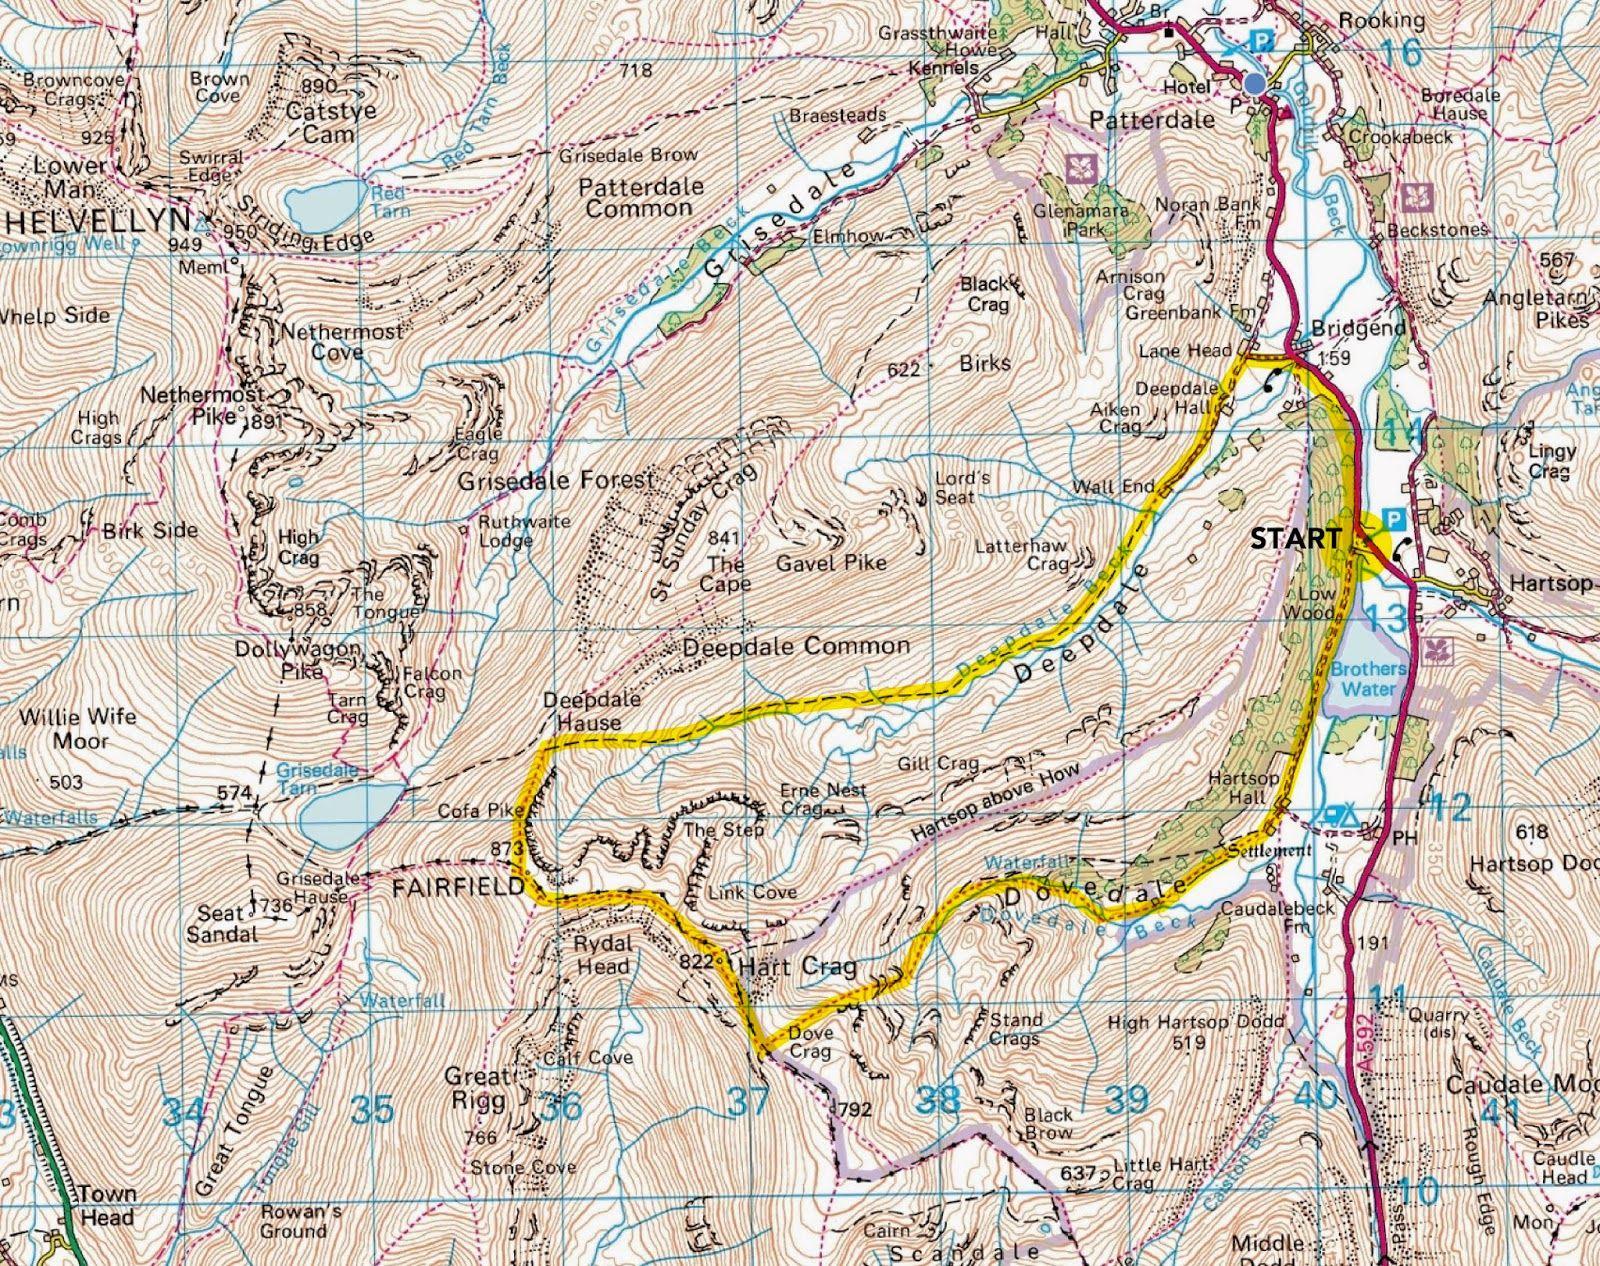 patterdale lake district map Fairfield Circular Walk From Patterdale Ullswater Lake District patterdale lake district map